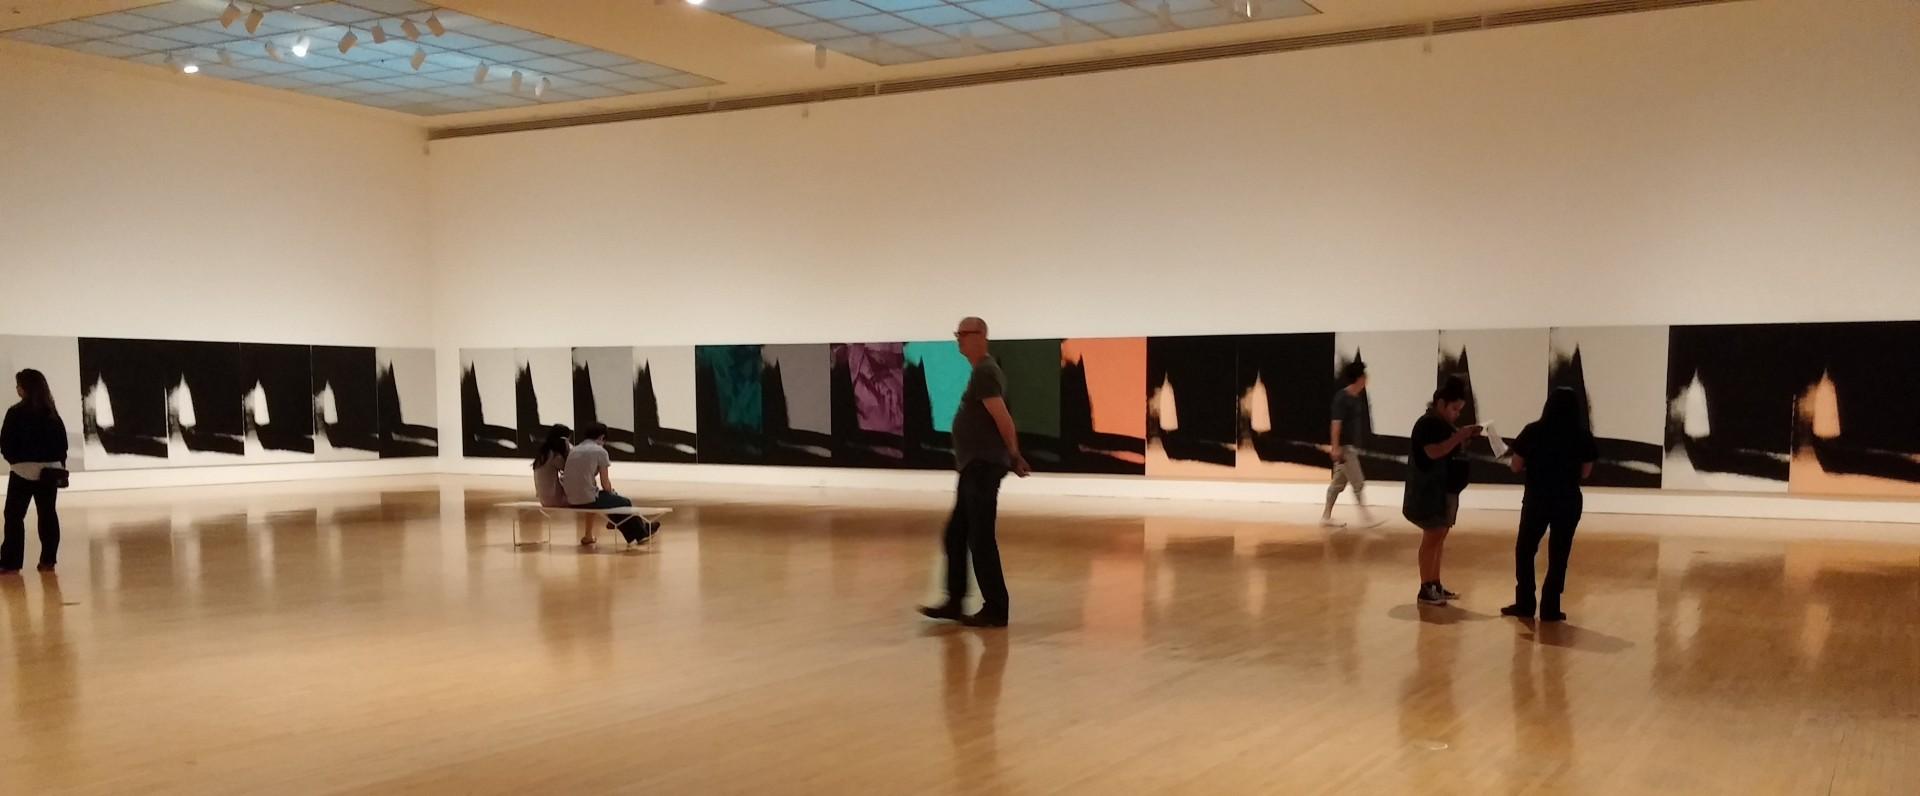 MOCA Andy Warhol Shadows photos © Rhonda P. Hill (3)